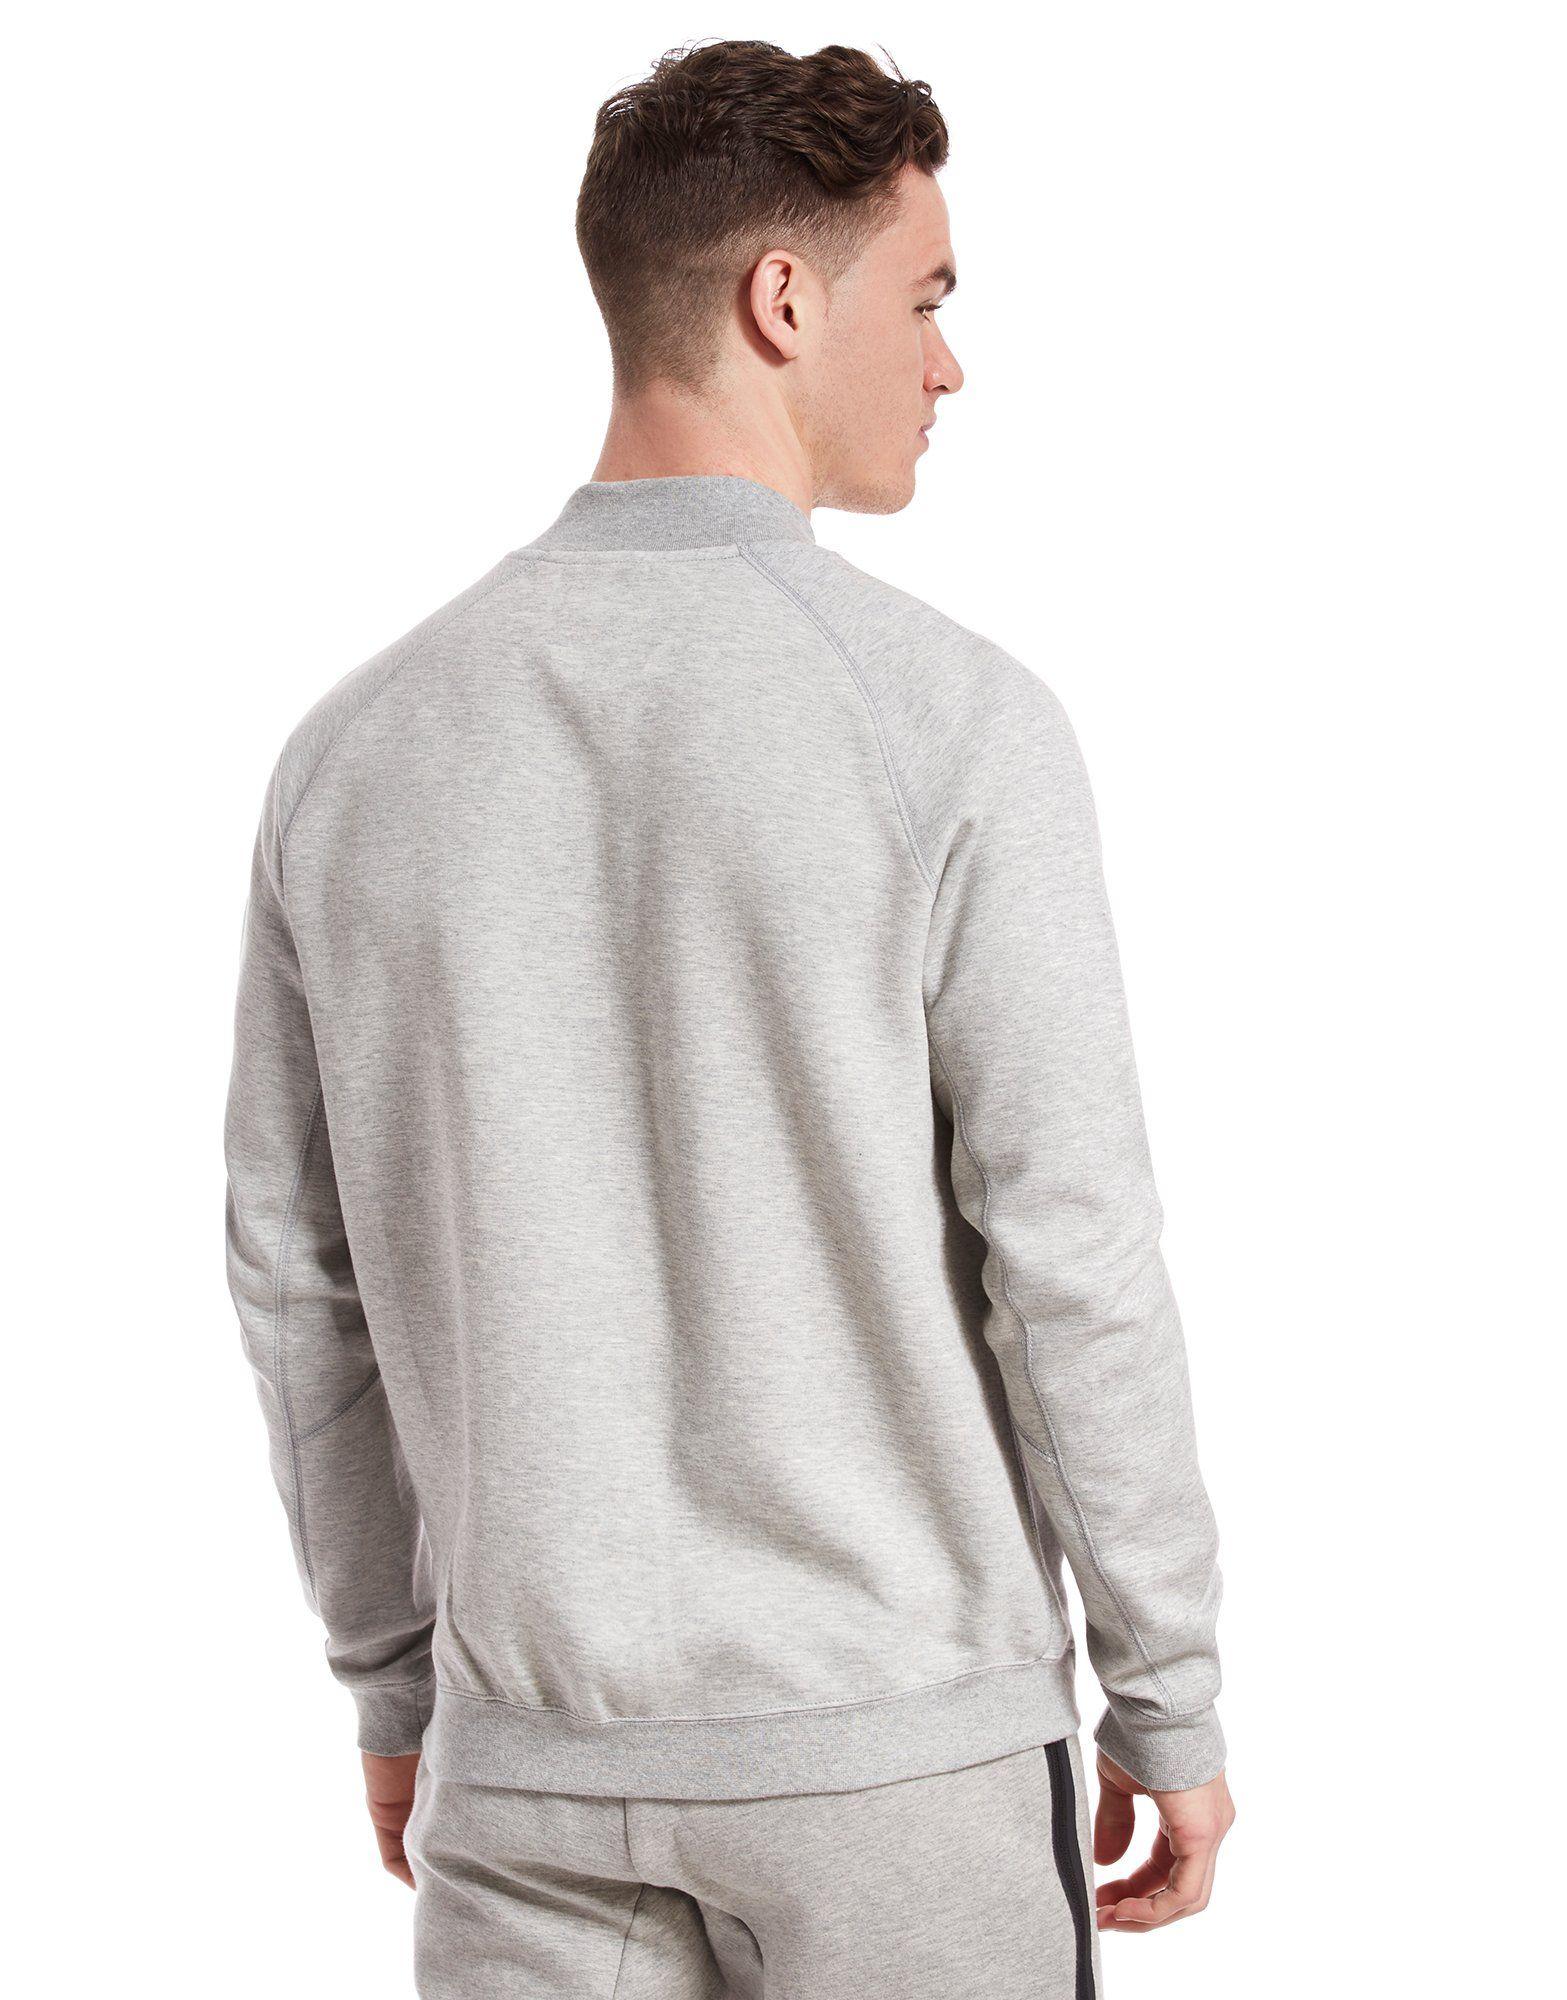 Nike Tech Varsity Jacket